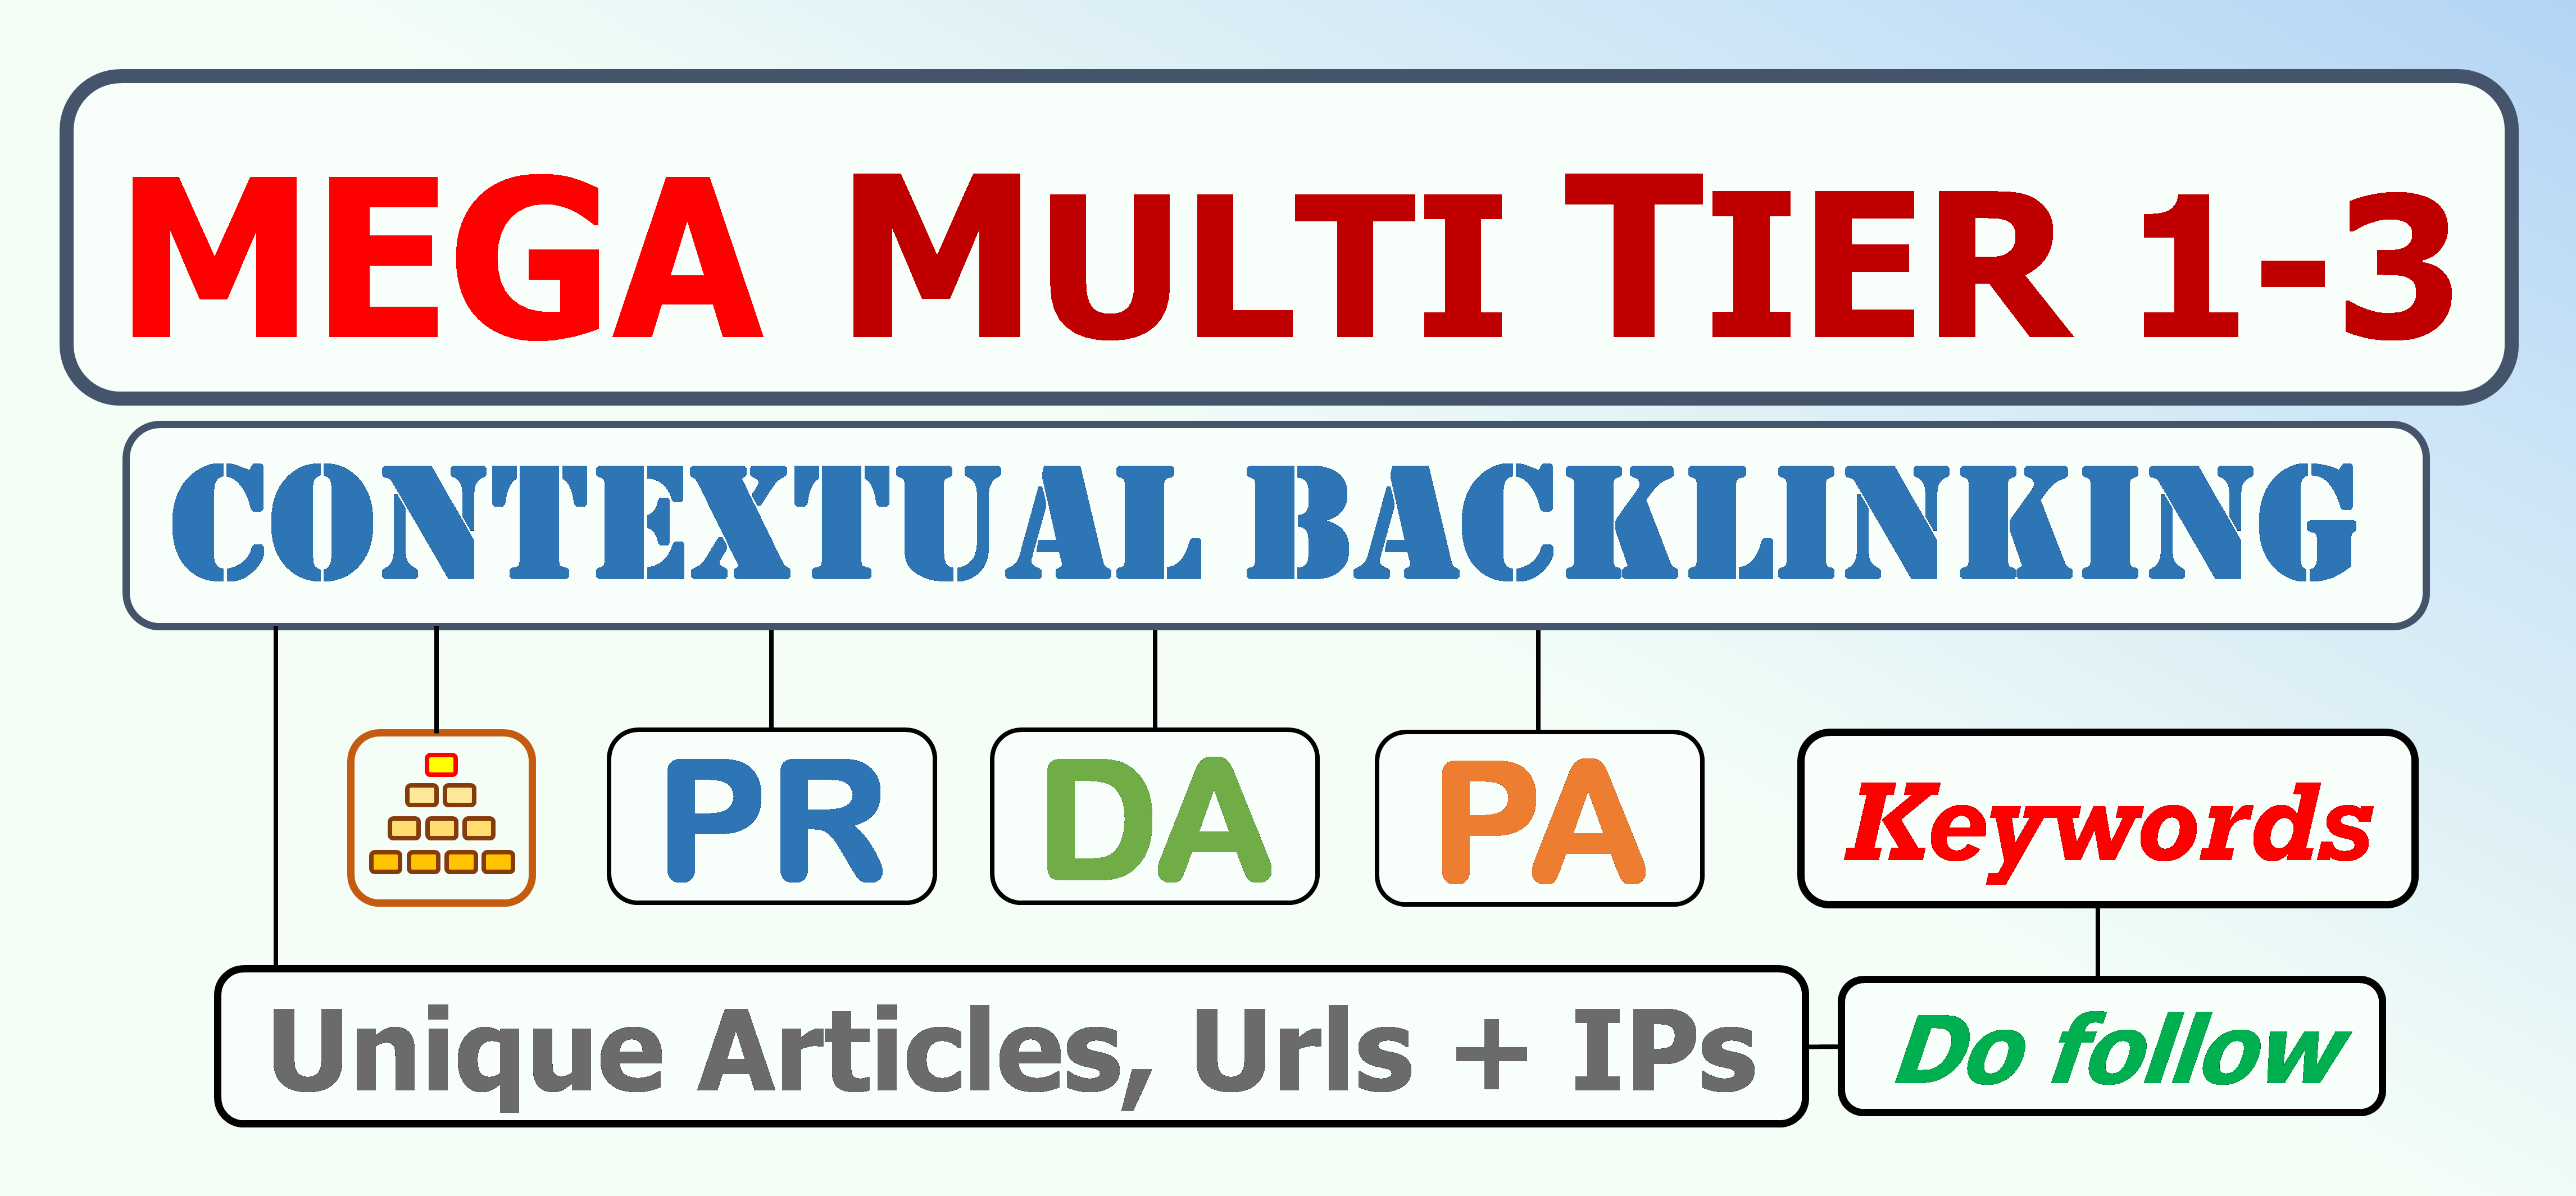 MEGA contextual Panda safe 4.2 super keyword booster tier3 Web 2.0 backlink pyramid link building